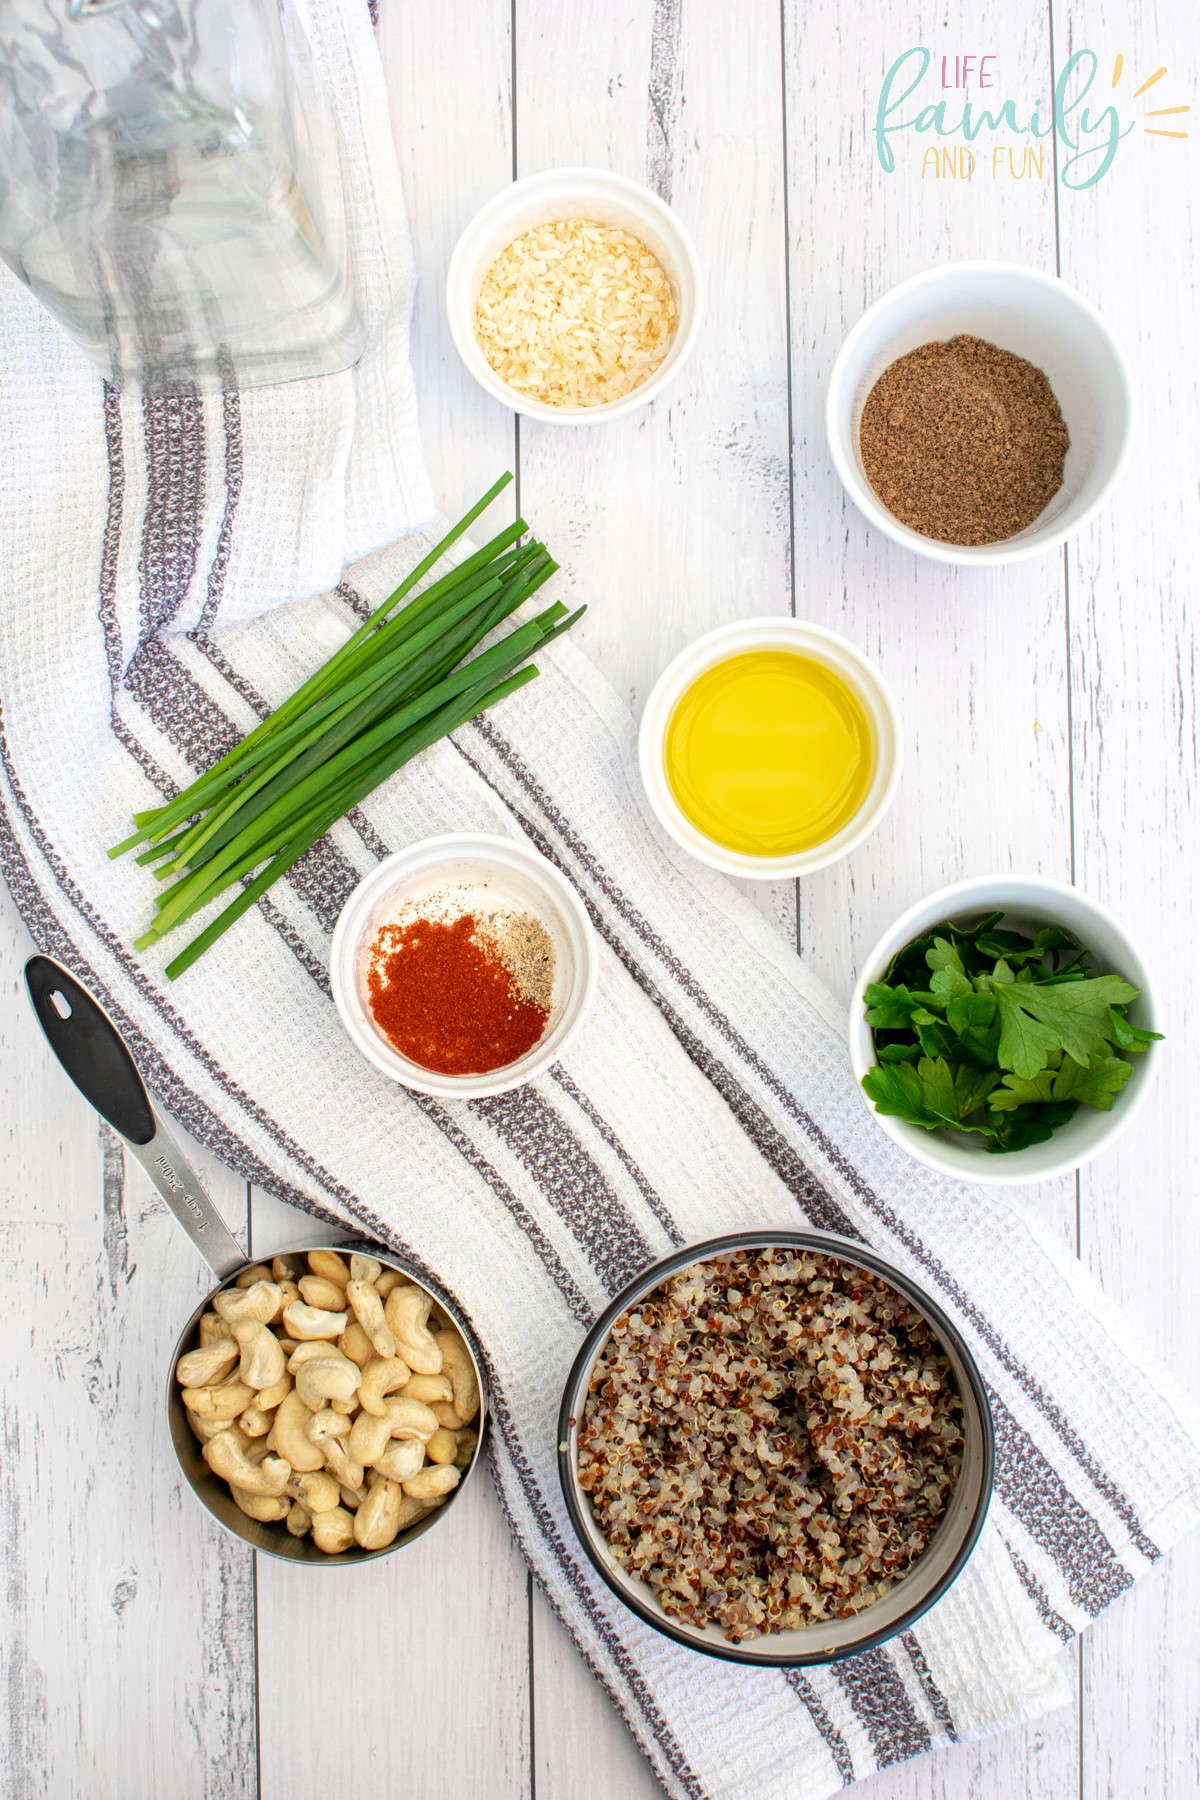 ingredient to make quinoa cakes